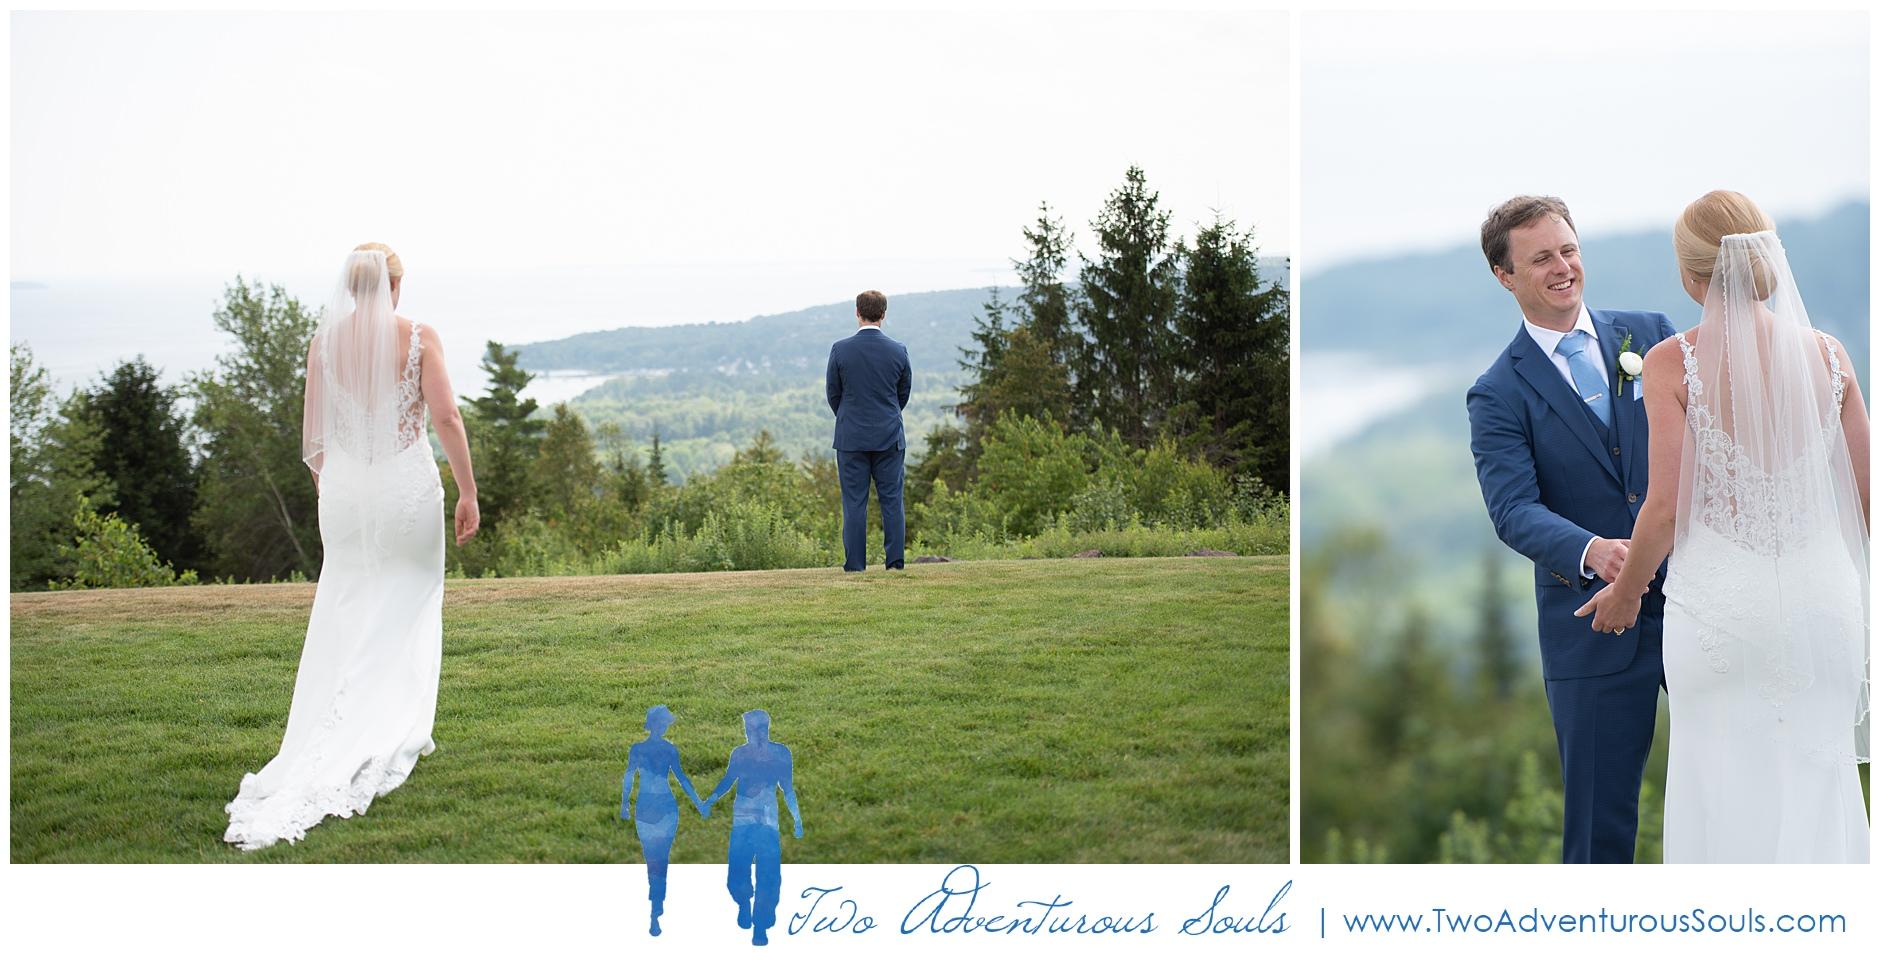 Maine Wedding Photographers, Point Lookout Wedding Photographers, Maine Elopement Photographers, Two Adventurous Souls-0080419_0021.jpg